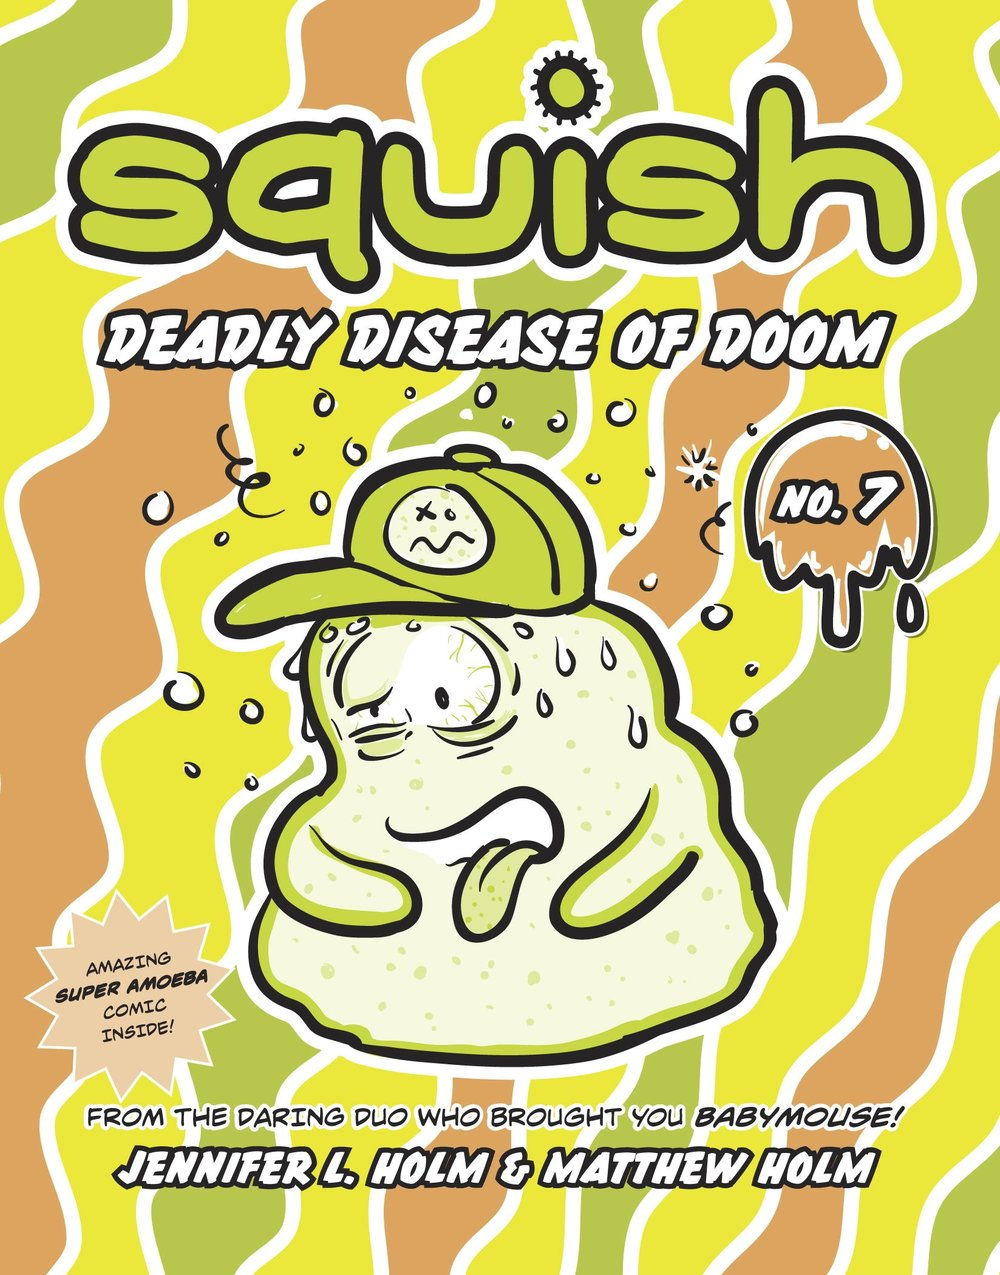 jenni-holm-squish-deadly-disease.jpg